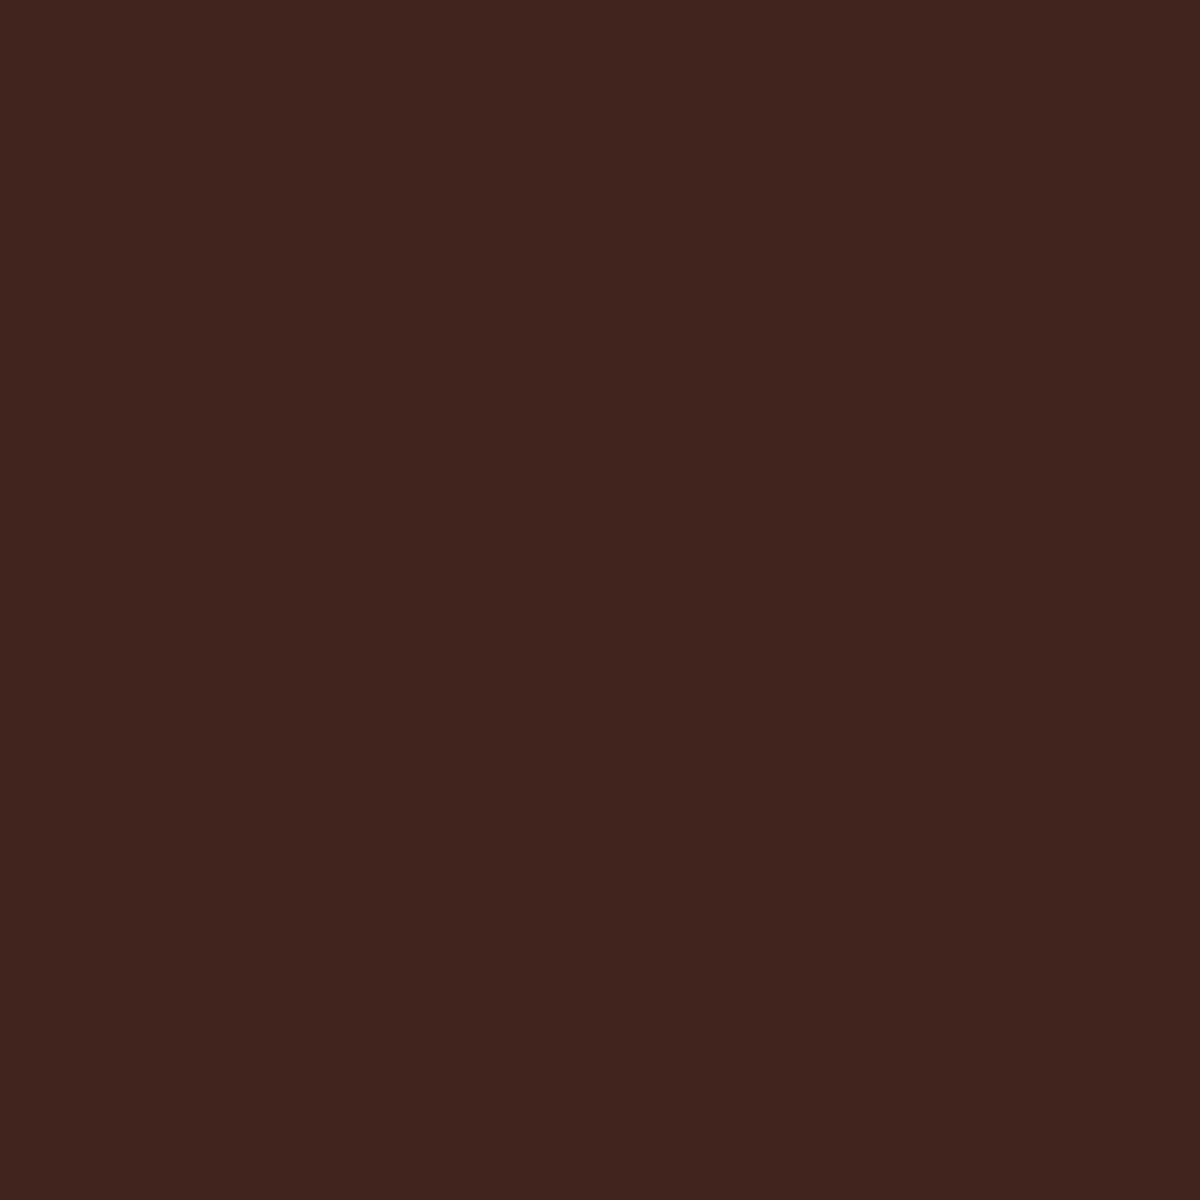 Виниловая самоклеющаяся пленка (глянец) G-3209 (1,06м х45,7м)